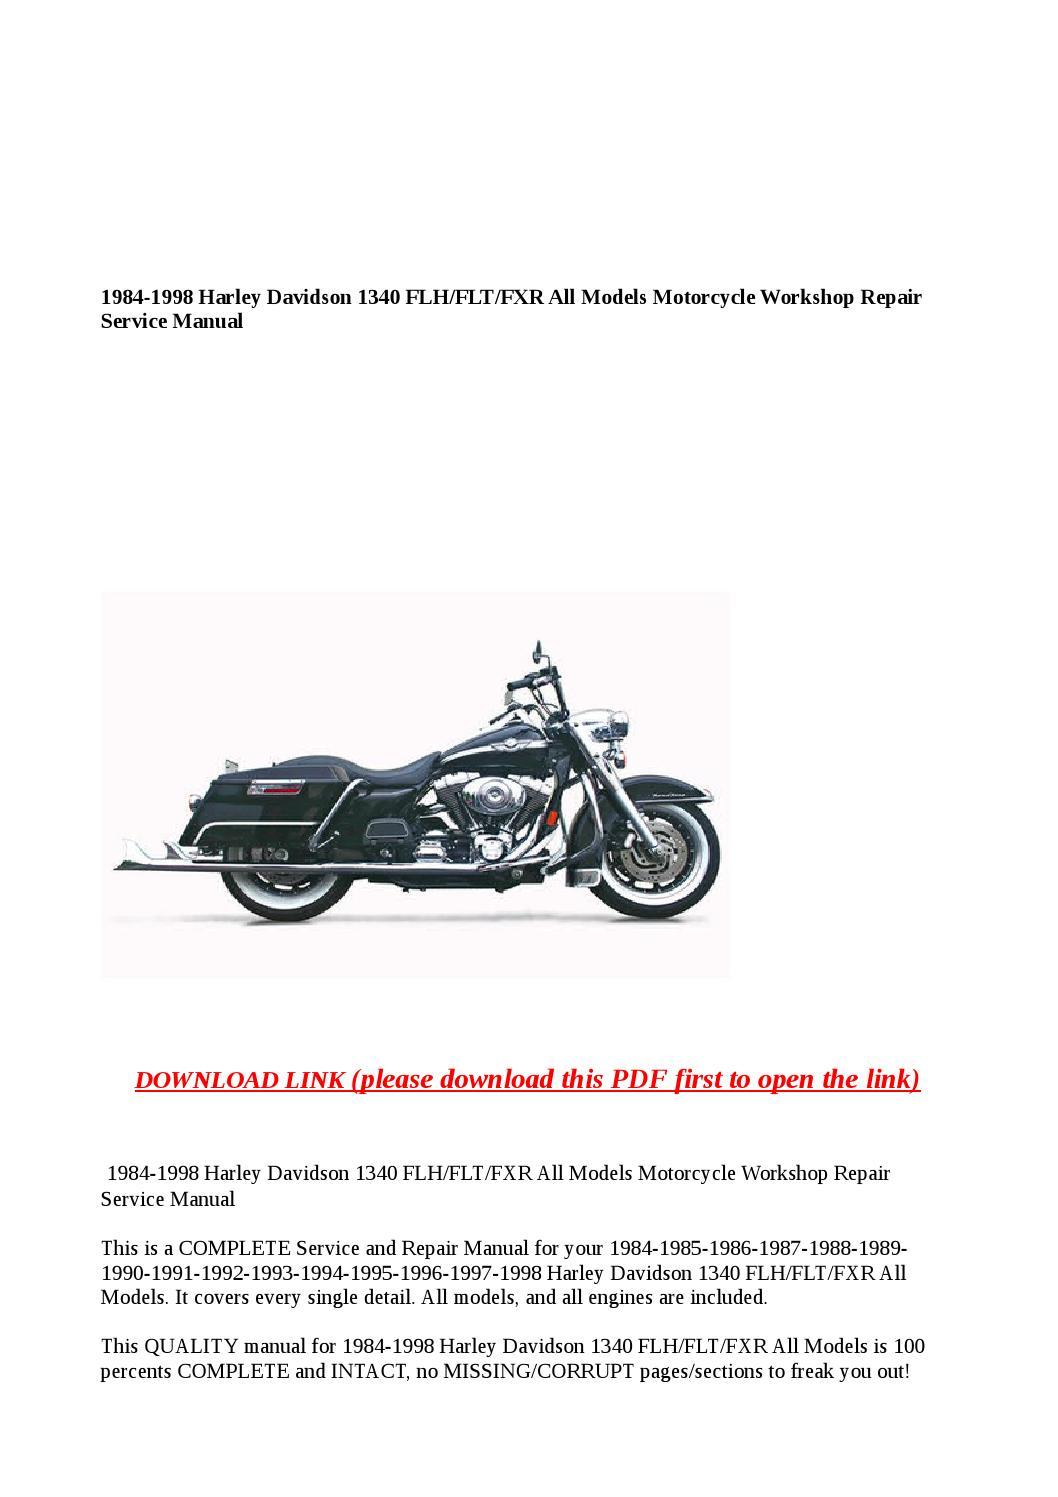 1984 1998 harley davidson 1340 flh flt fxr all models motorcycle workshop  repair service manual by Greace Clark - issuu